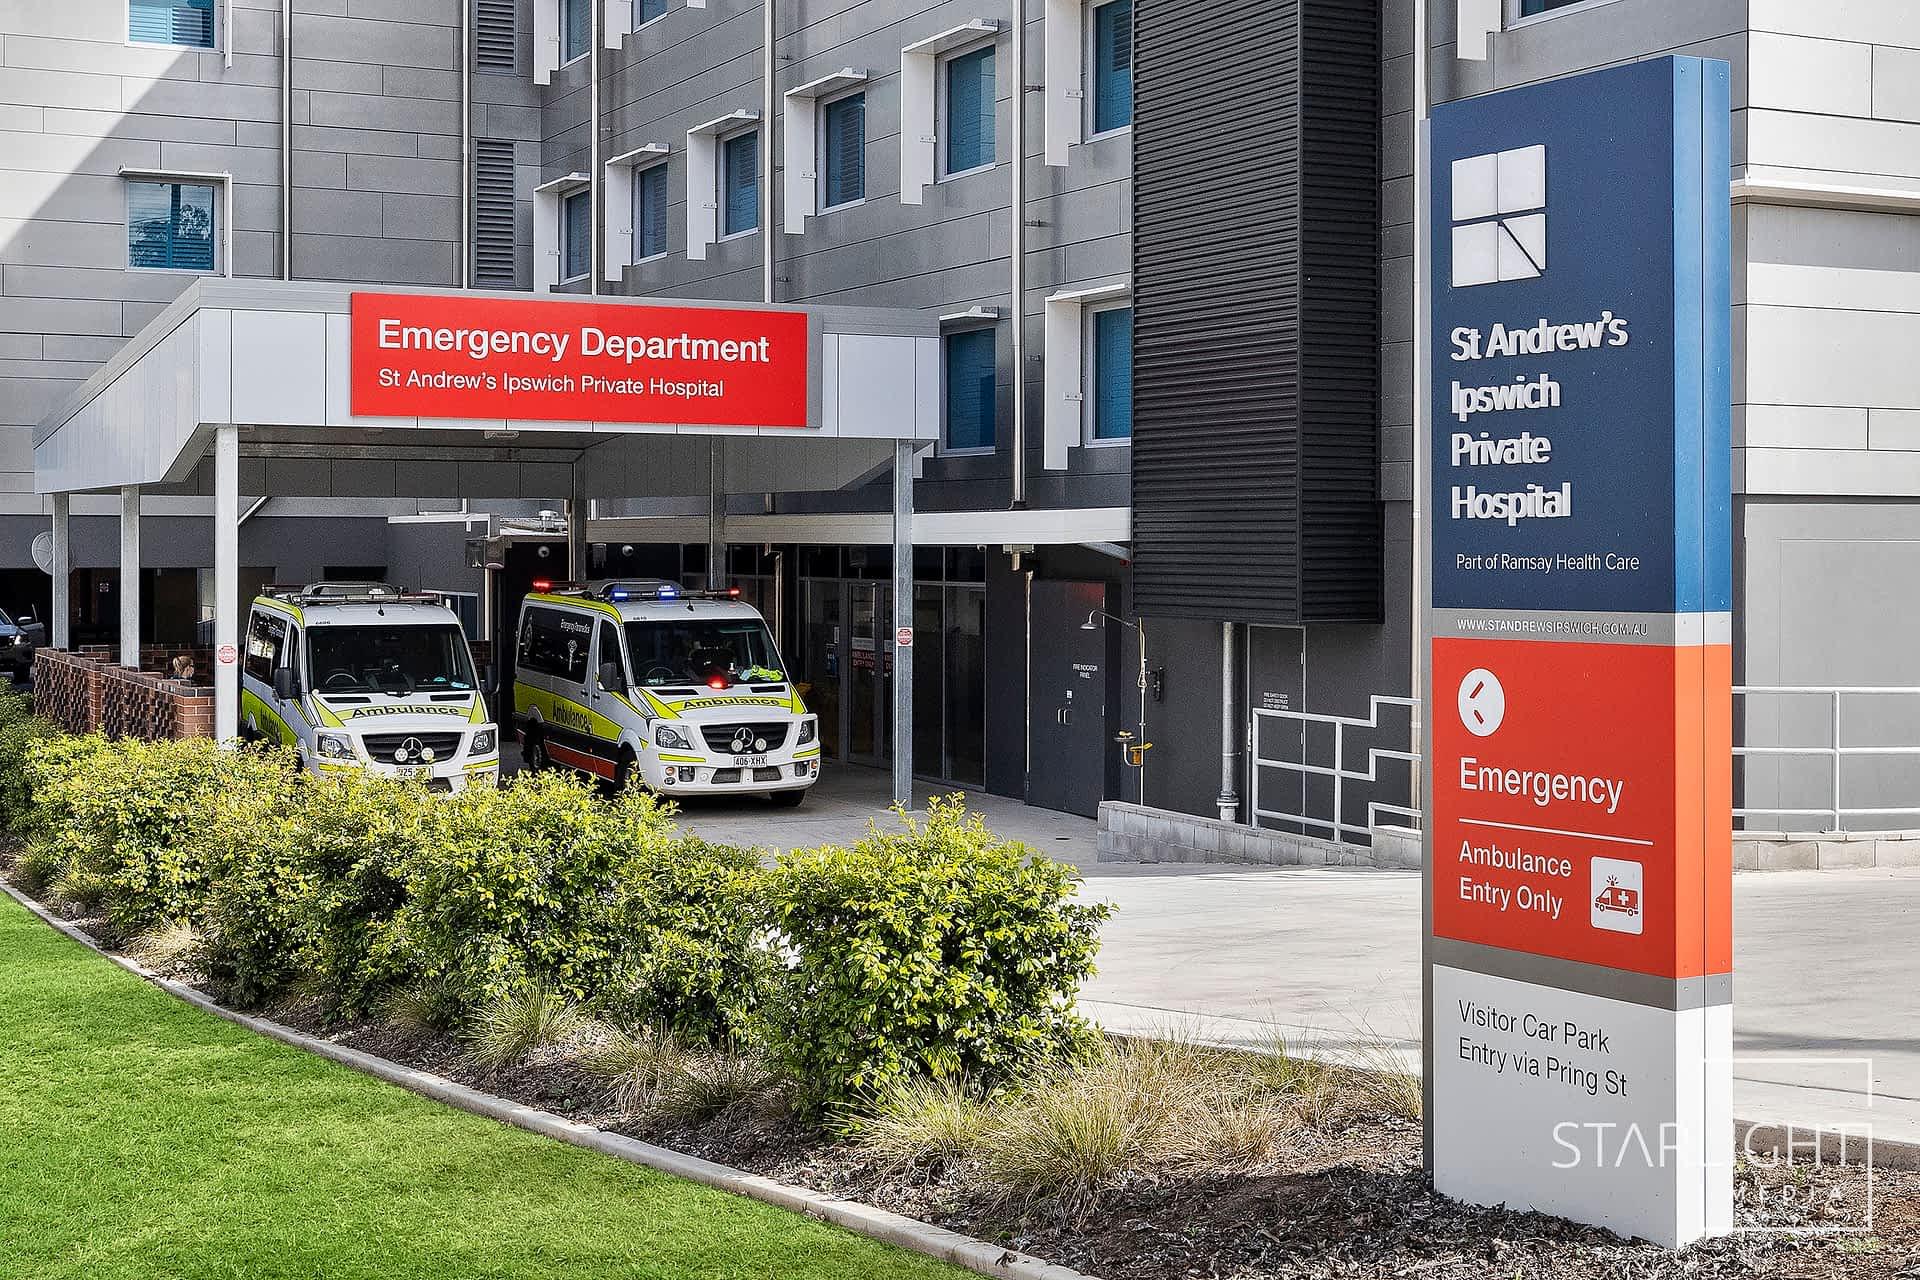 Photography Ramsay Health Care St Andrew's Hospital Ipswich